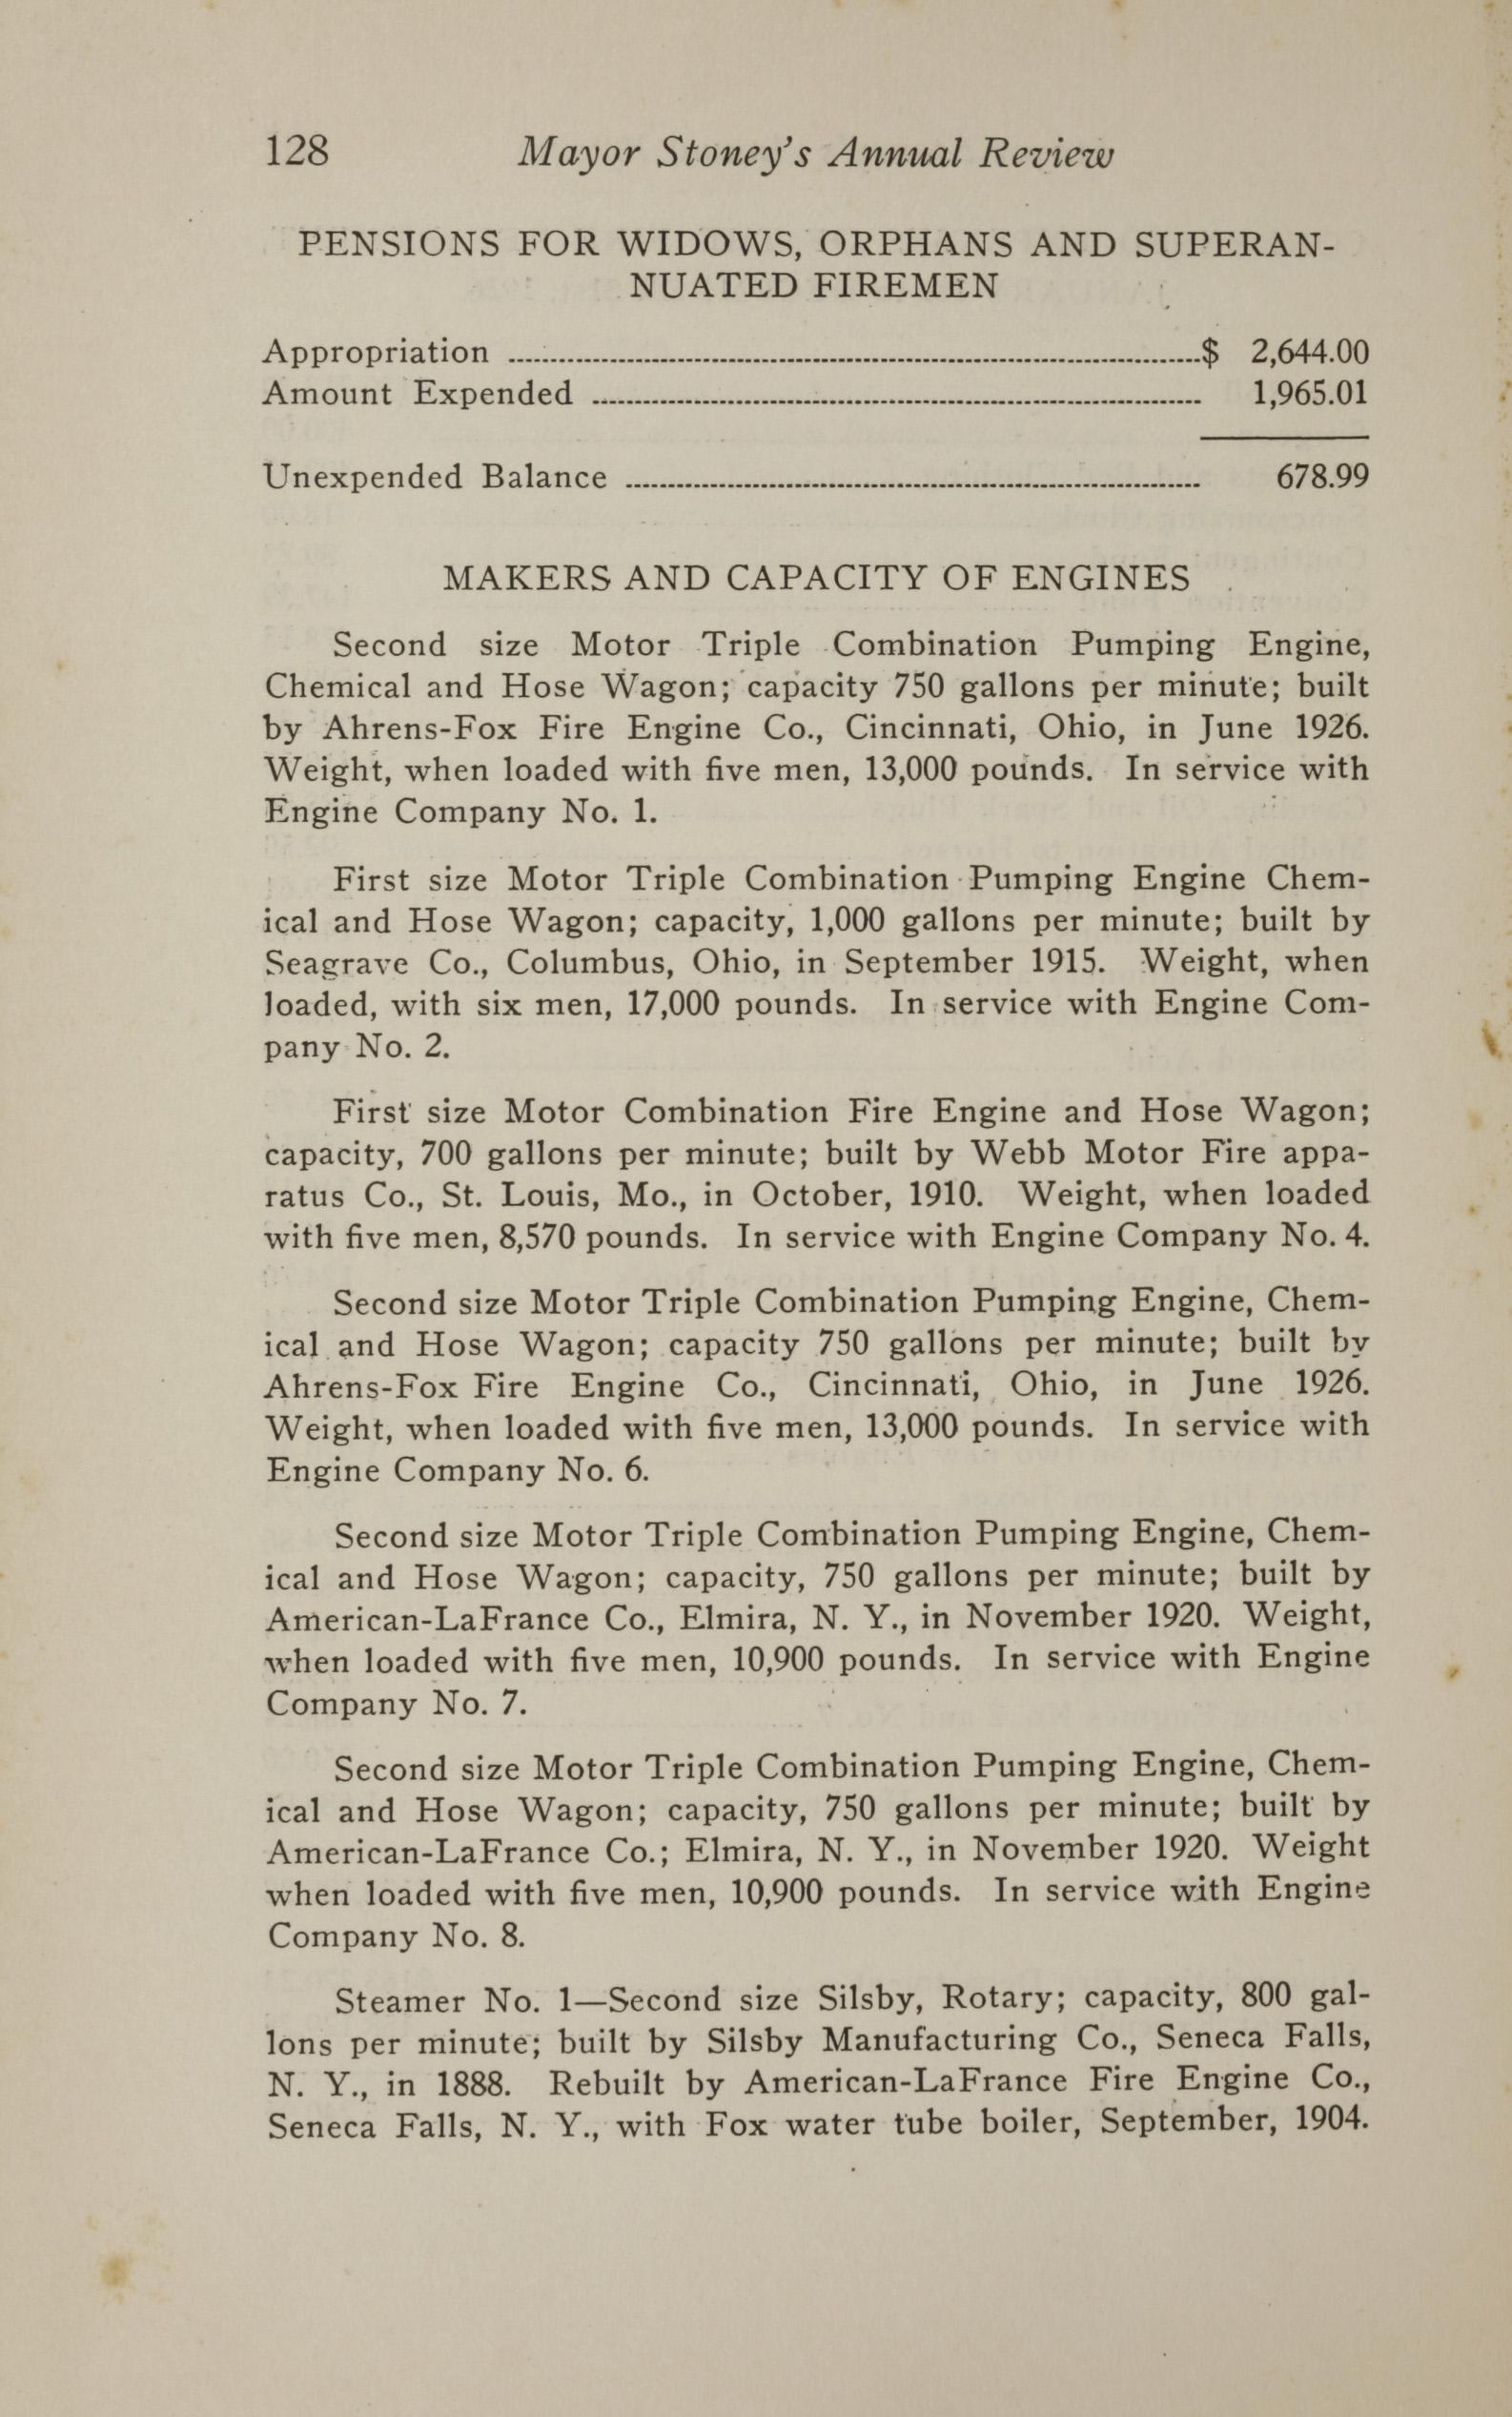 Charleston Yearbook, 1926, page 128